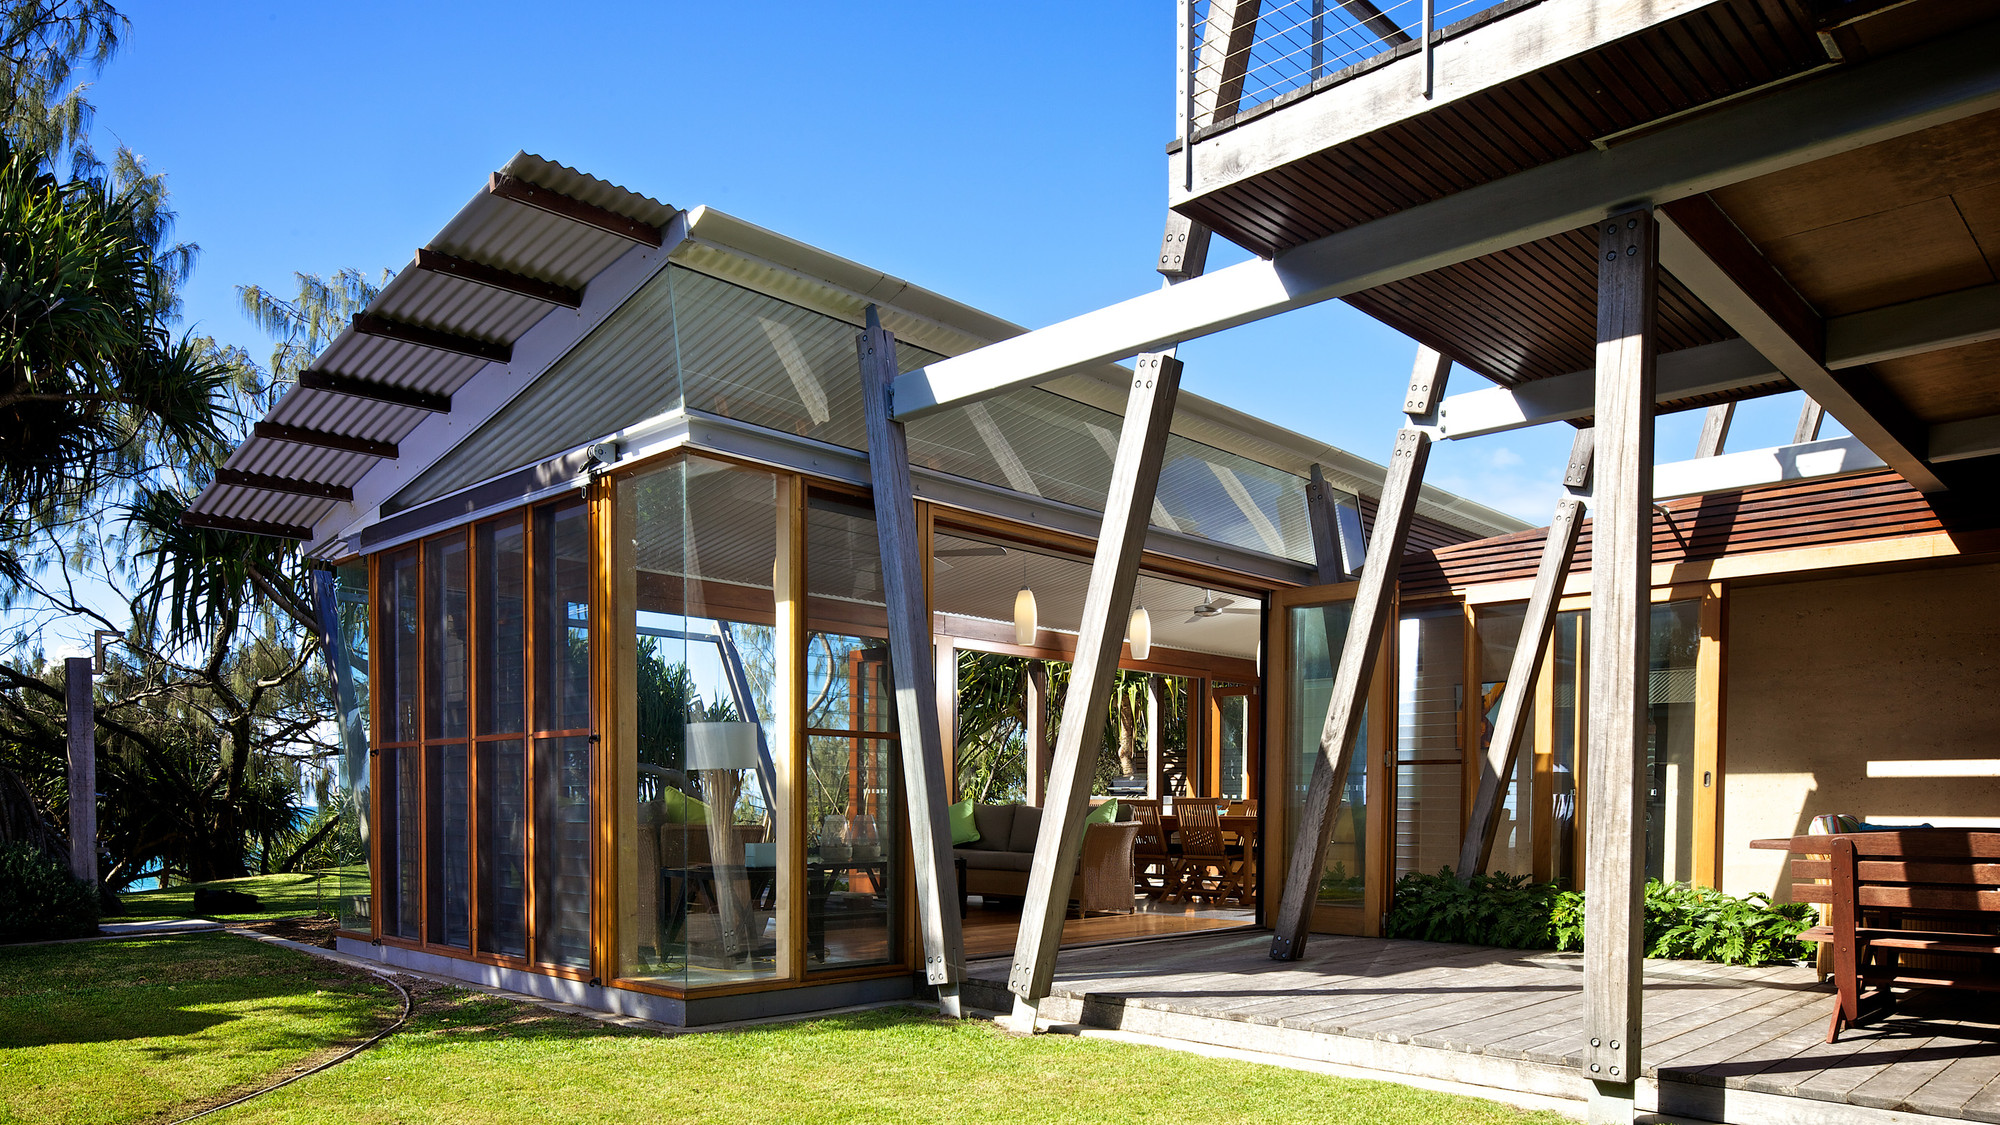 Gallery of currimundi beach house loucas zahos for Holiday home designs australia